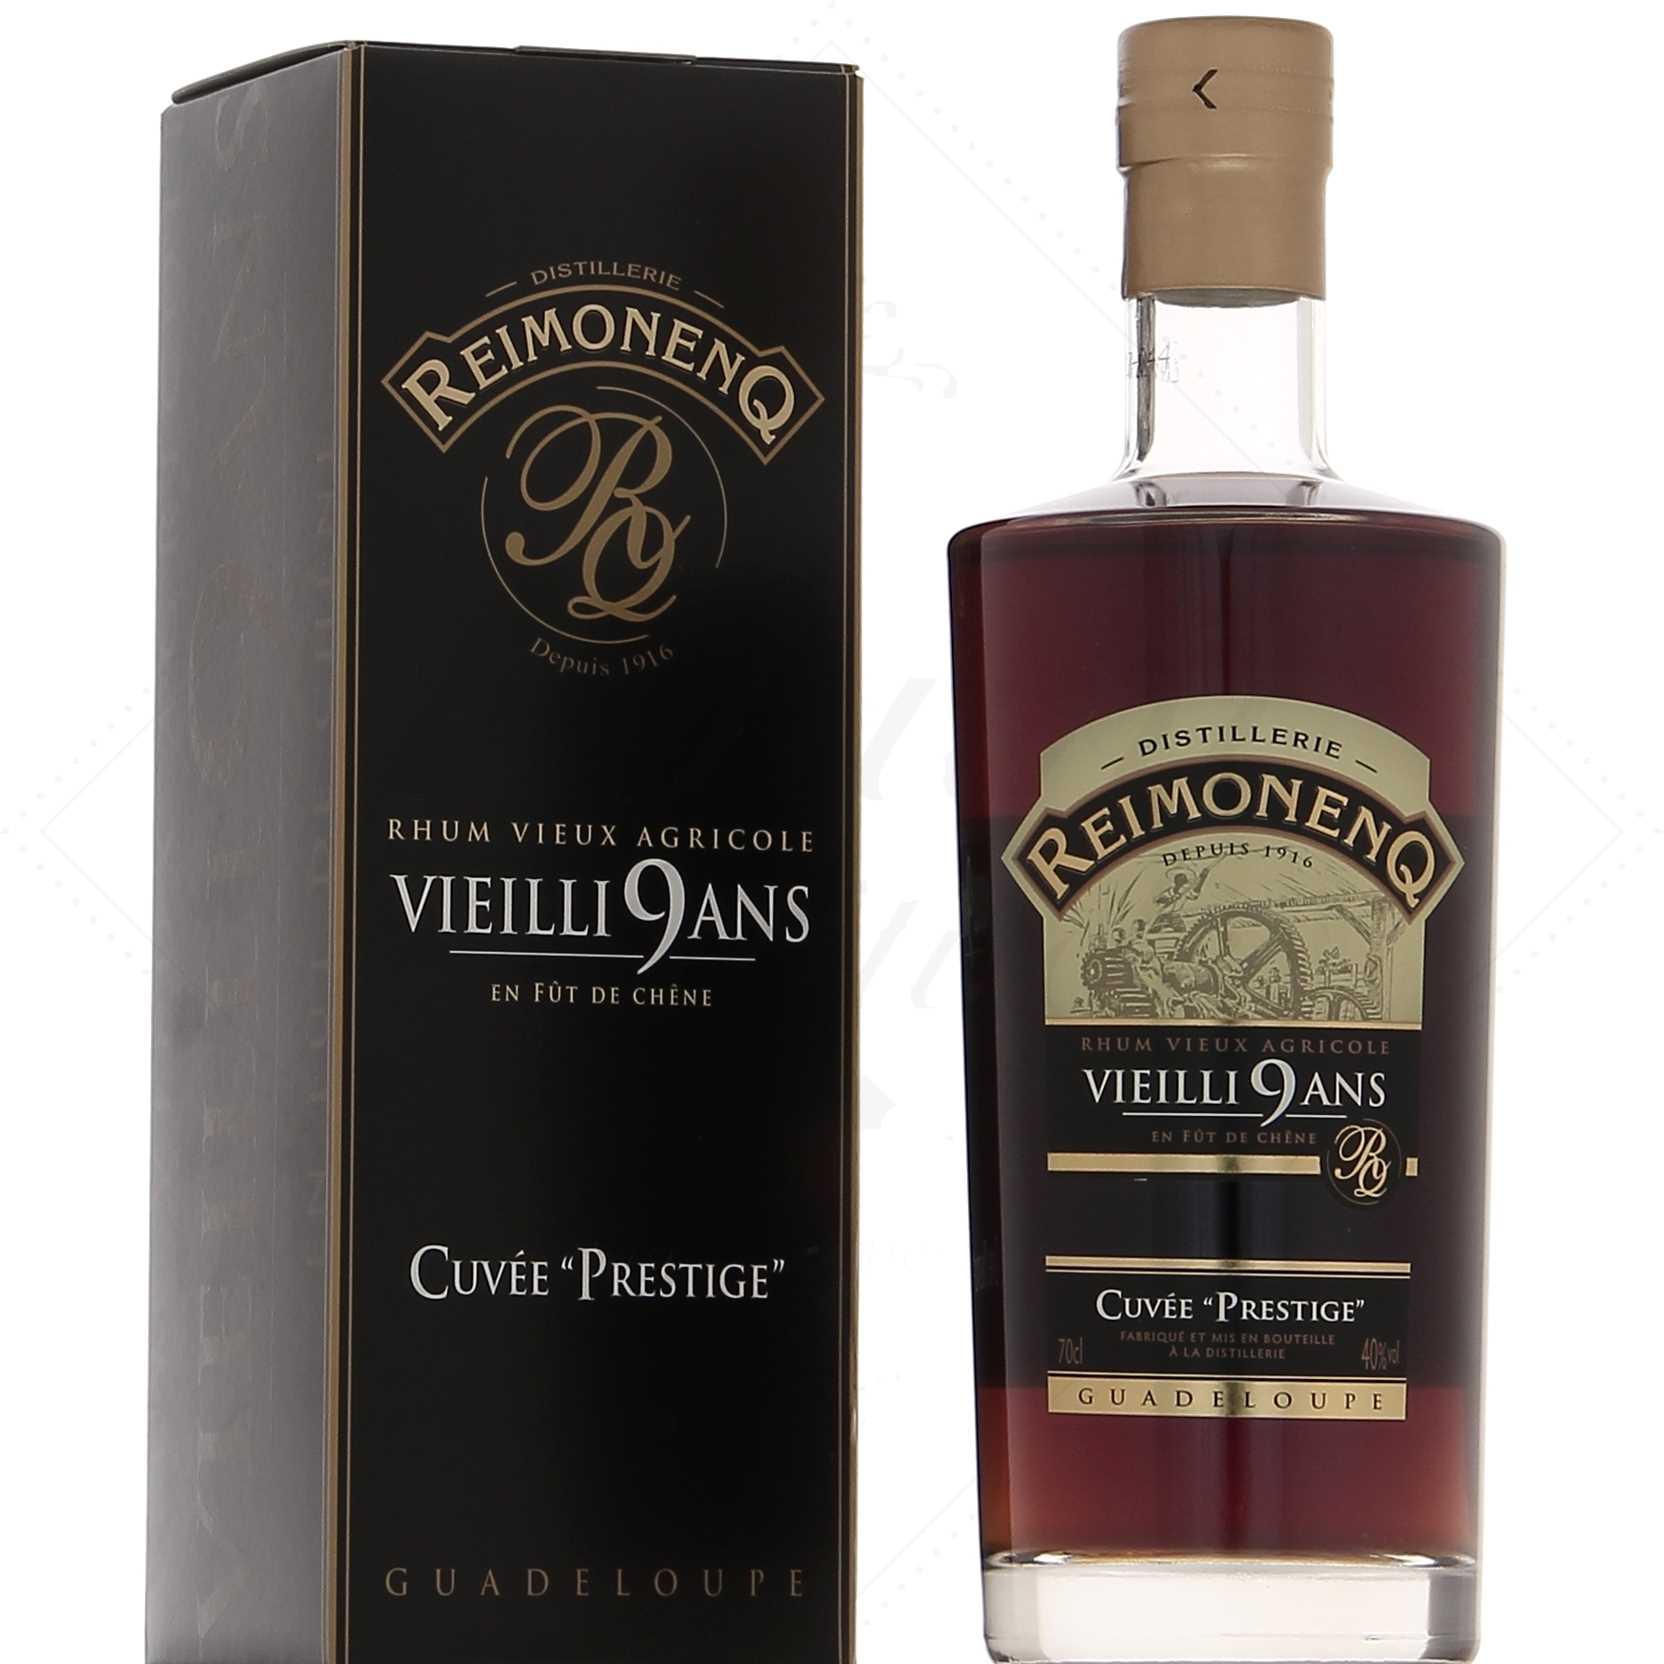 Distillato Rhum Agricole Vieilli 9 Ans Cuveè Prestige Reimonenq